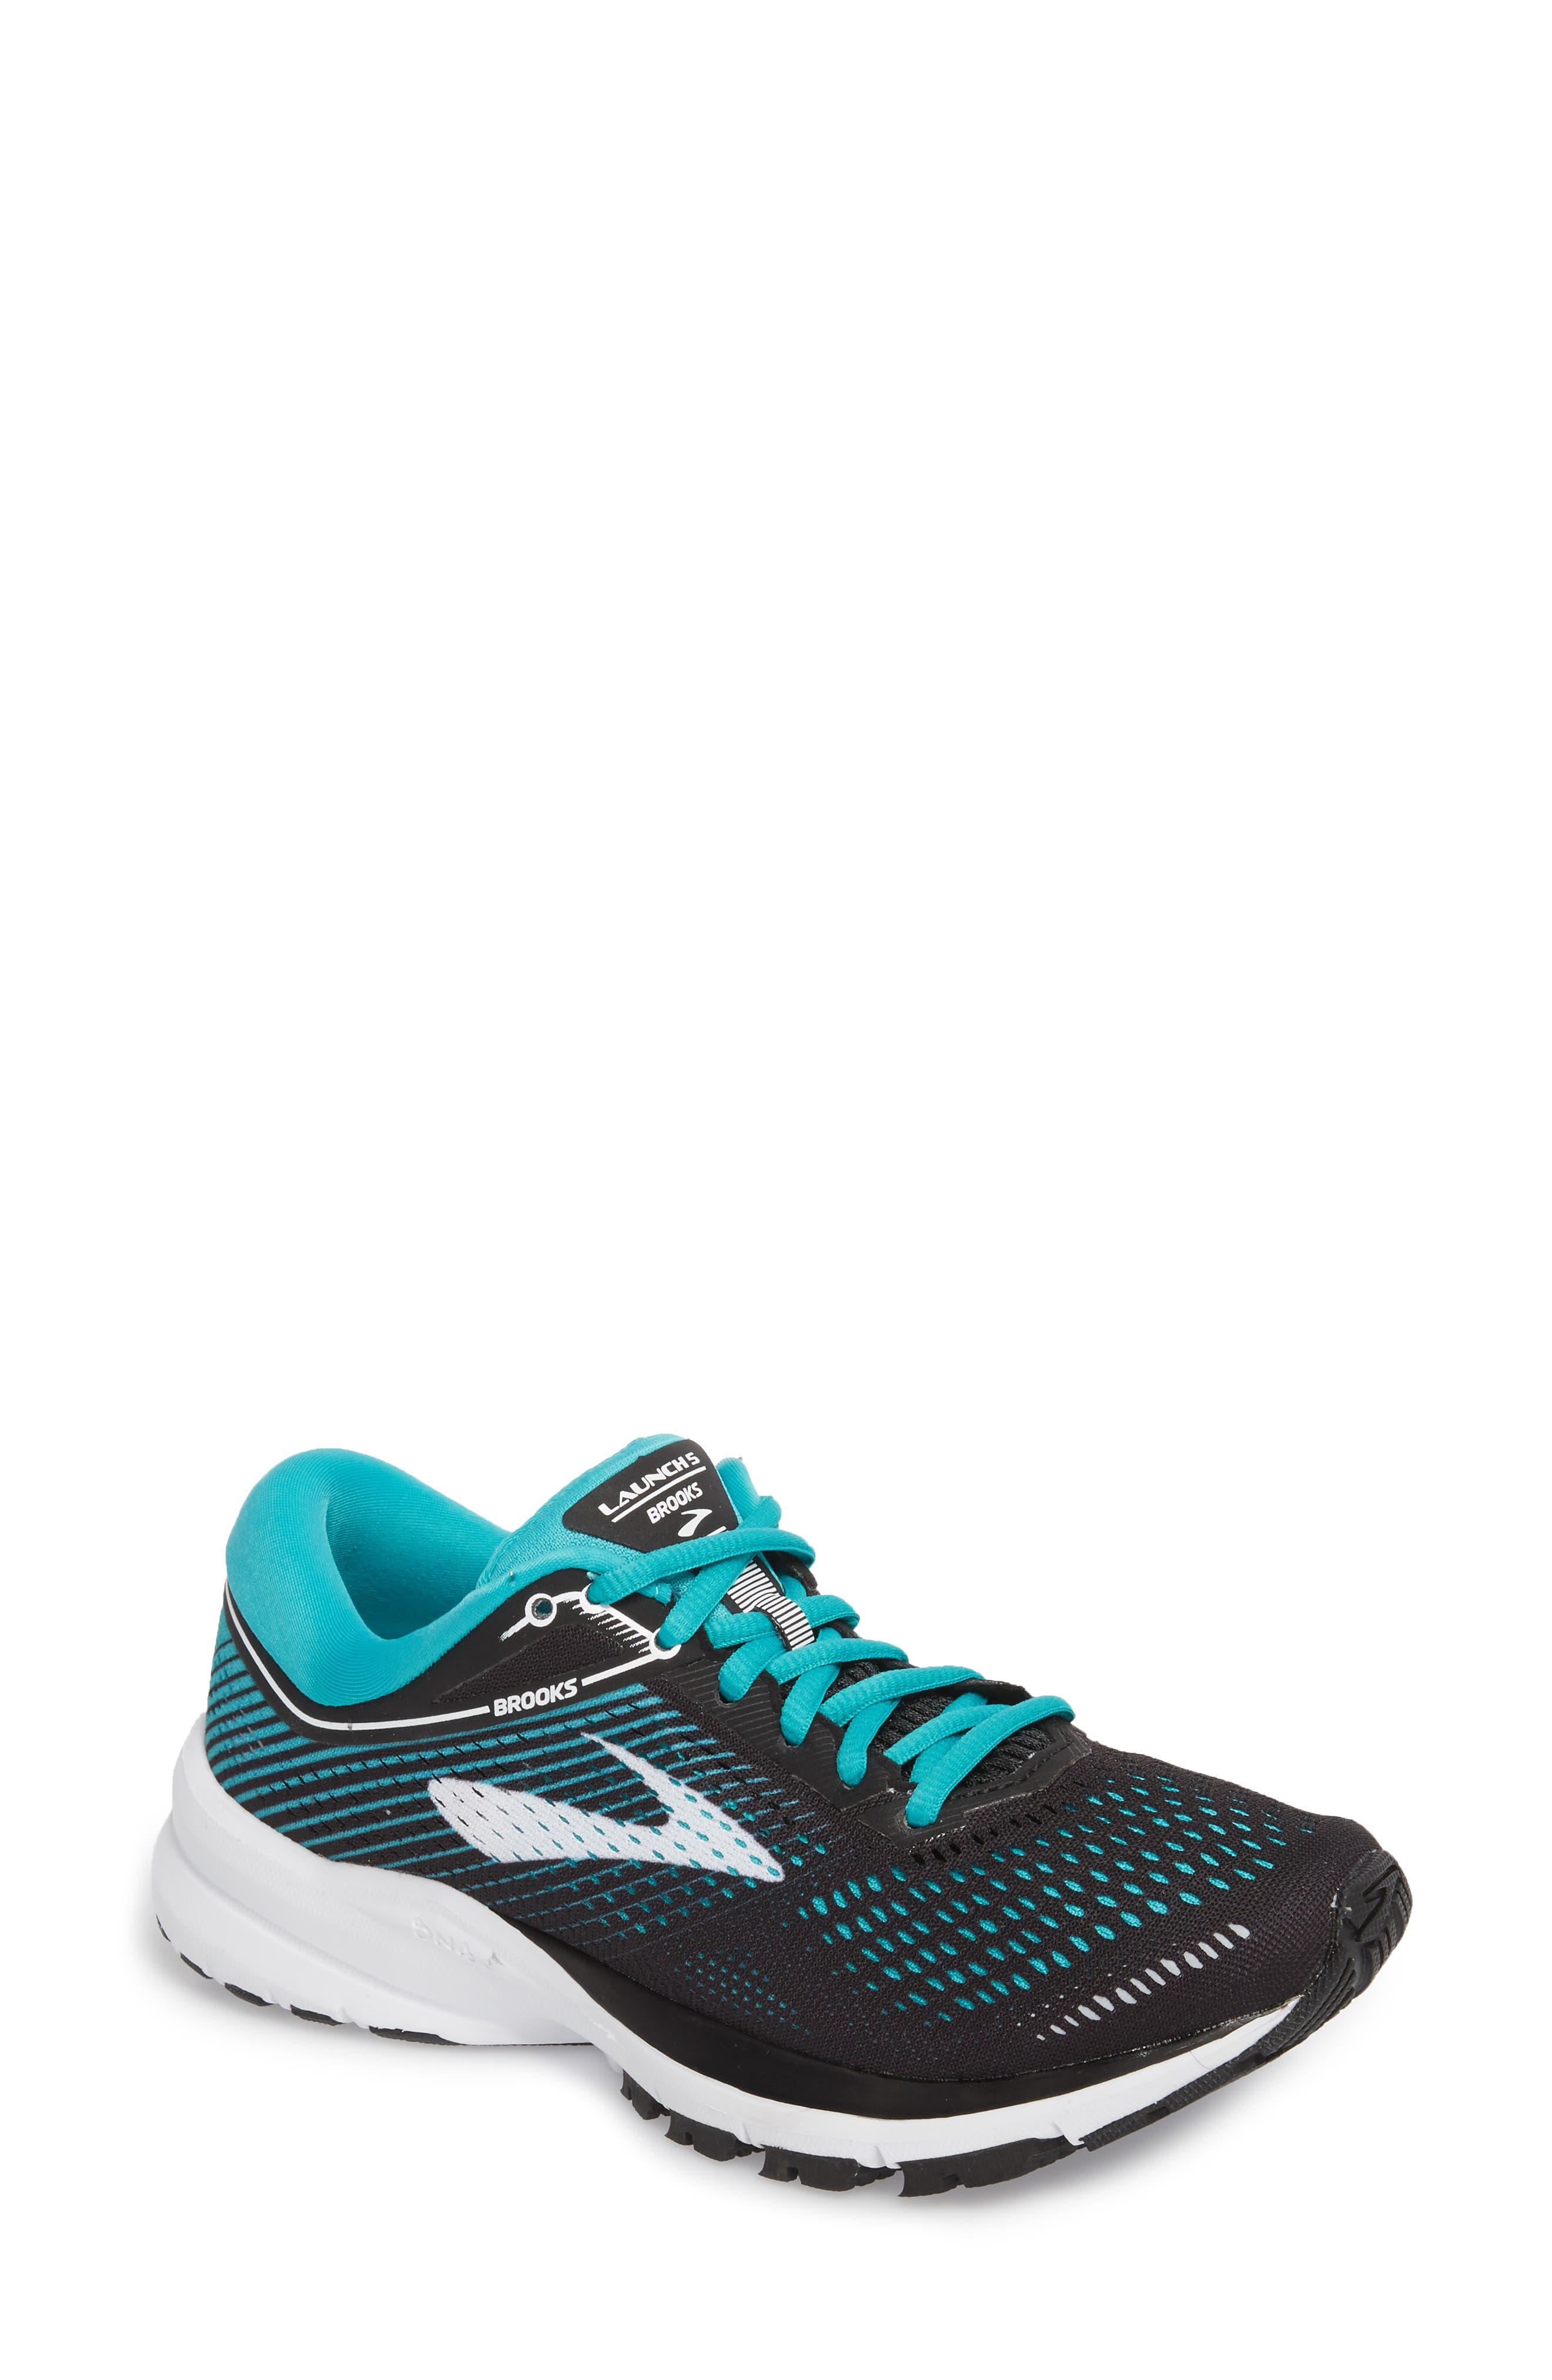 BROOKS,                             Launch 5 Running Shoe,                             Main thumbnail 1, color,                             BLACK/ TEAL GREEN/ WHITE